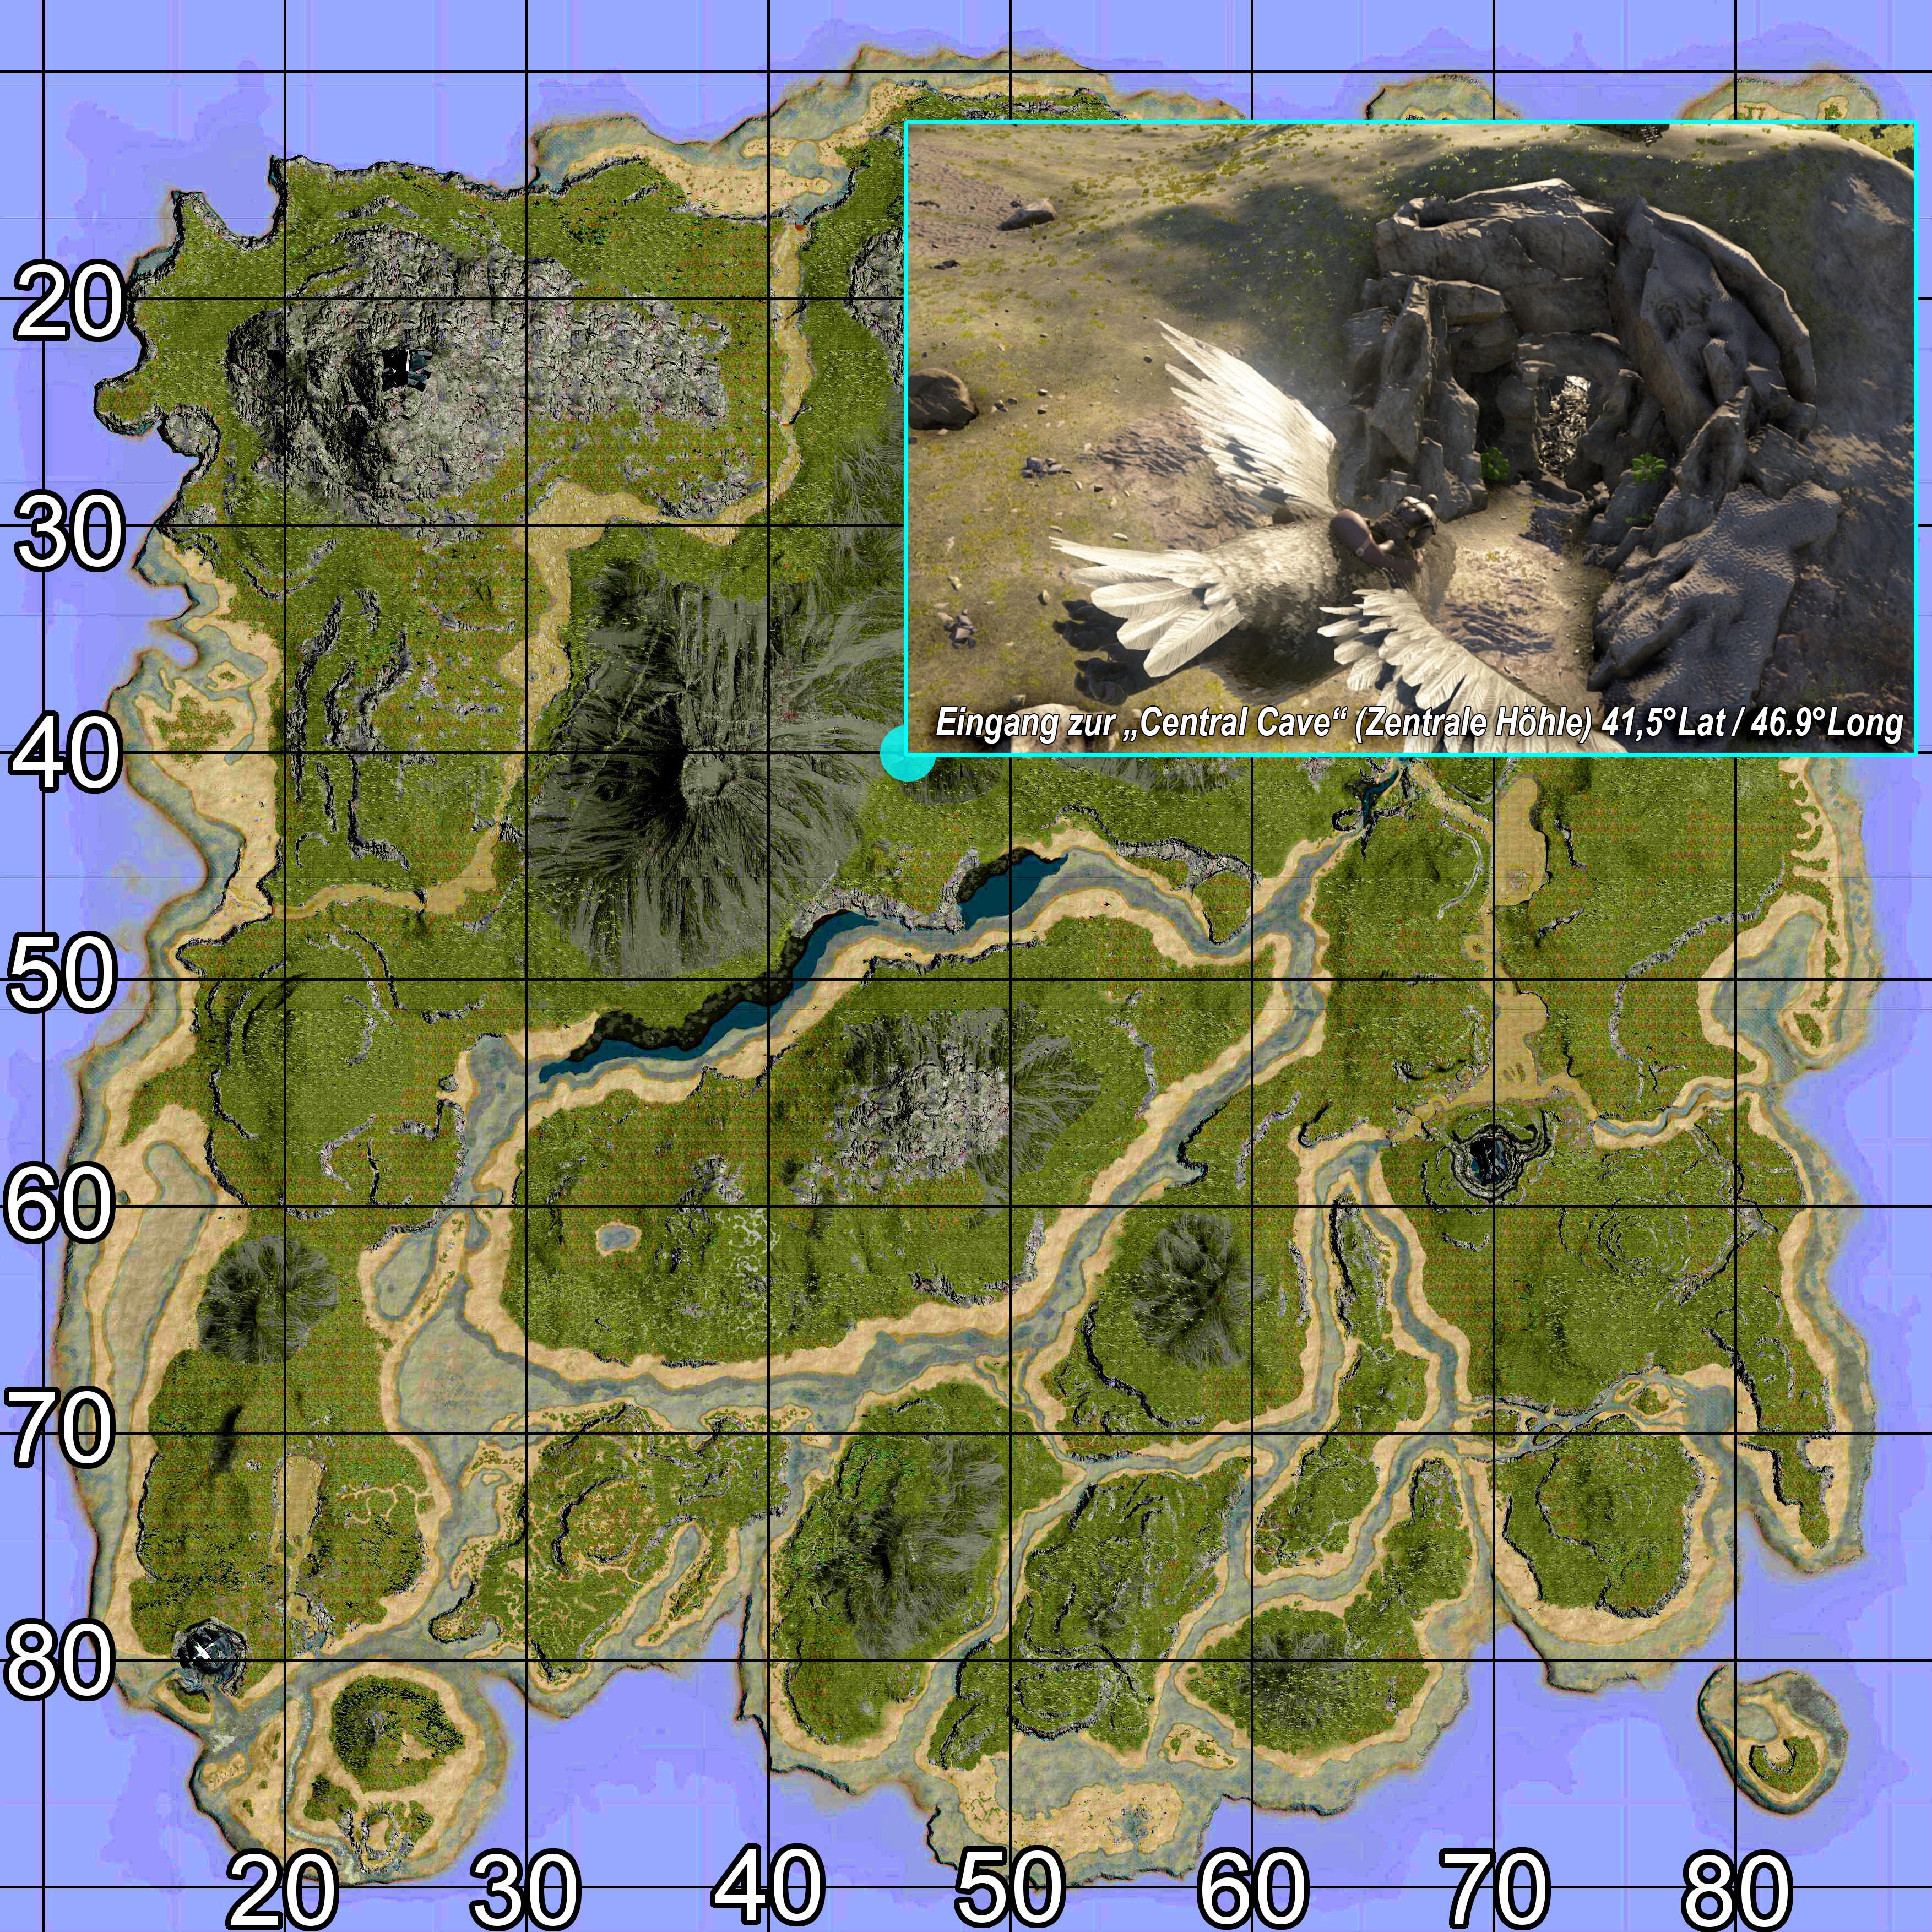 Ark Karte The Island.Die Höhlen In Ark The Island Map Tutorials Howto Ark